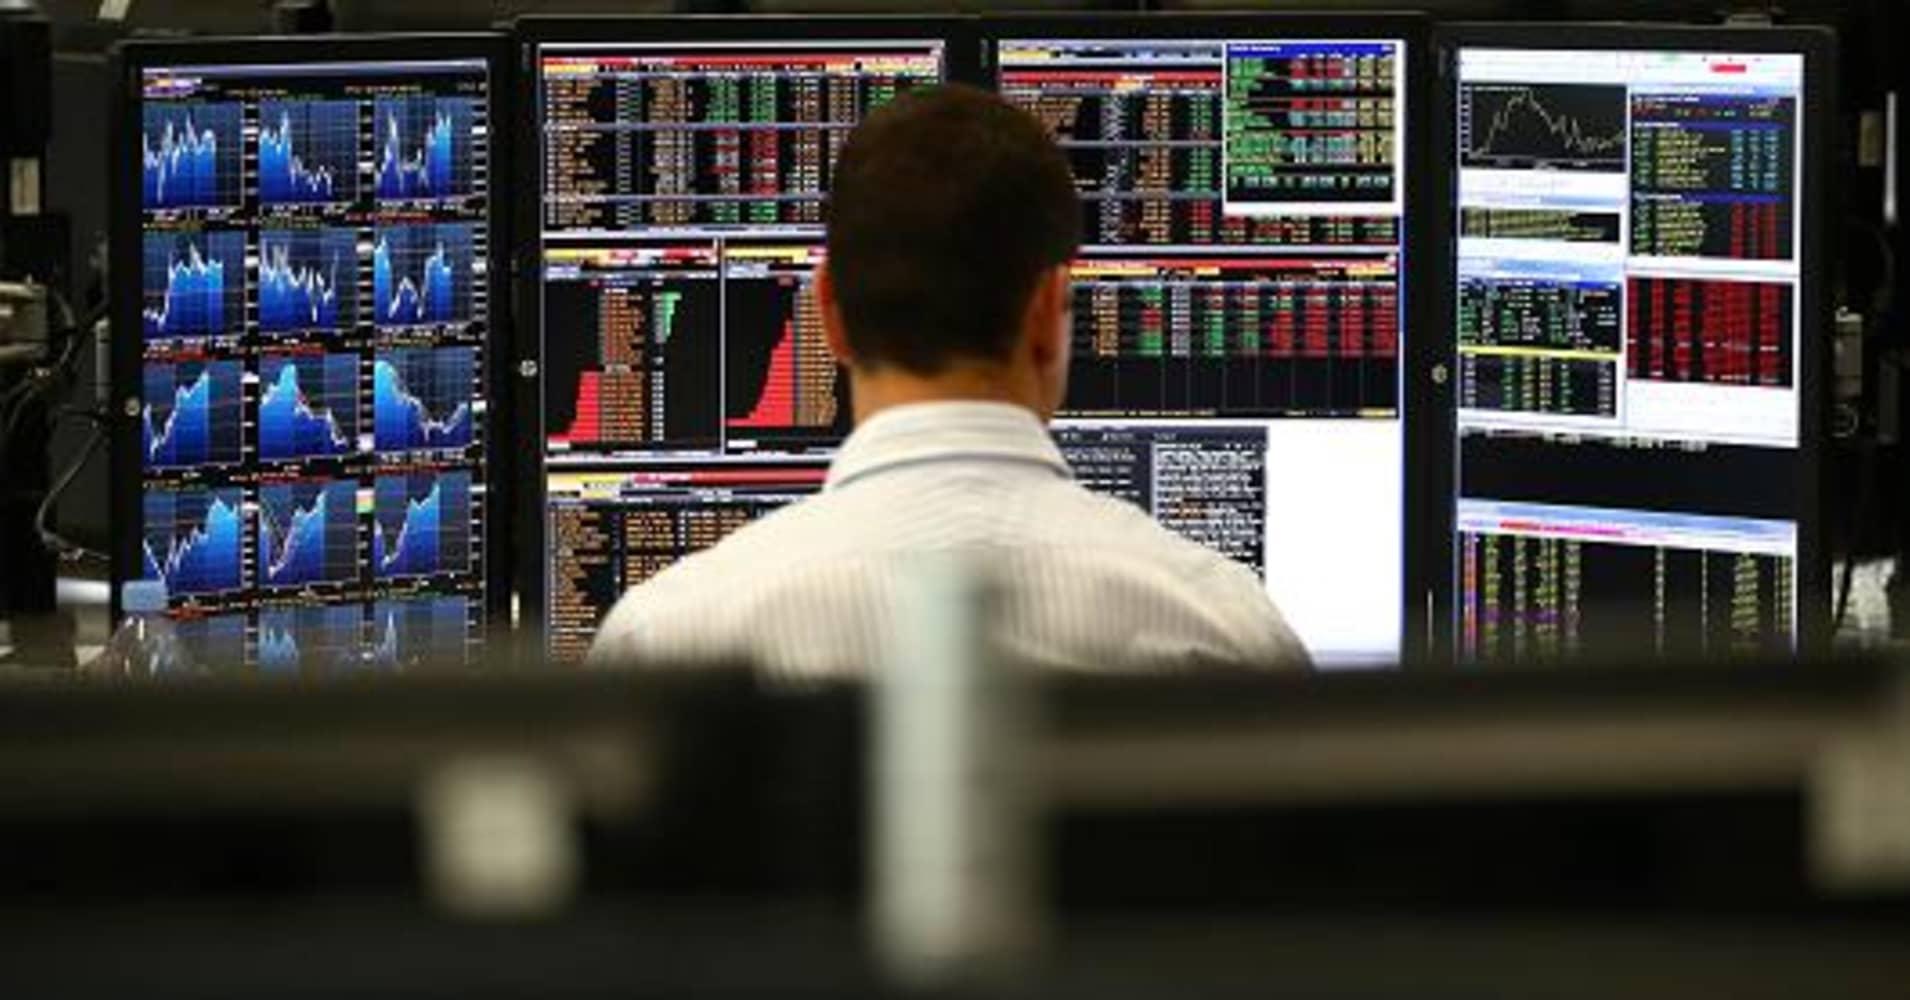 Global markets sell-off: Southeast Asia, Japan, financials